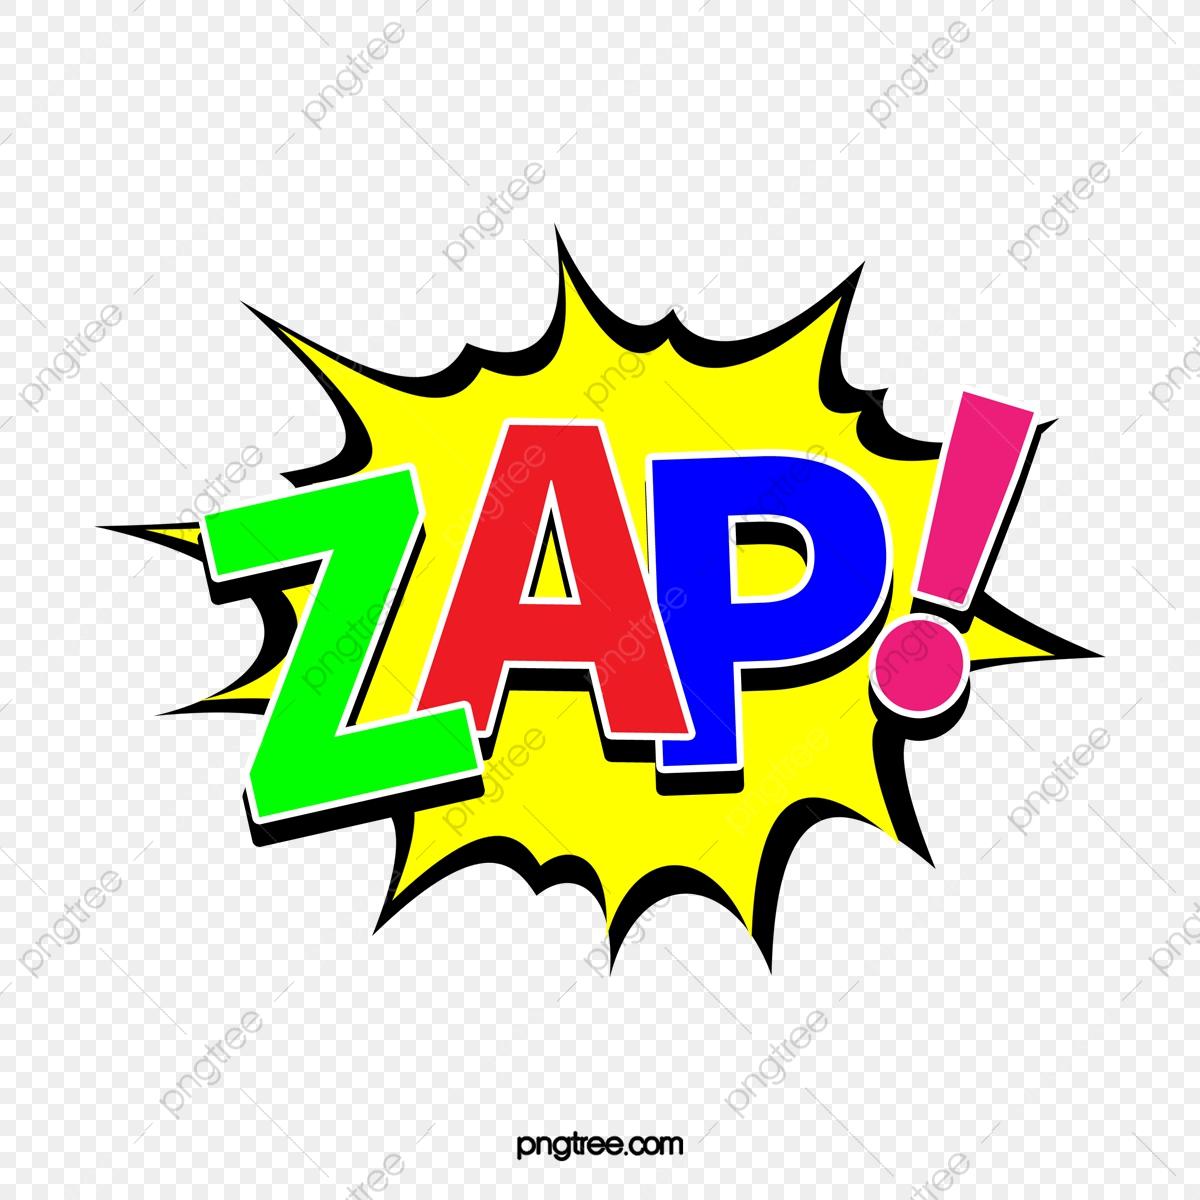 English Explosive Sticker For Color Zap, Cartoon.